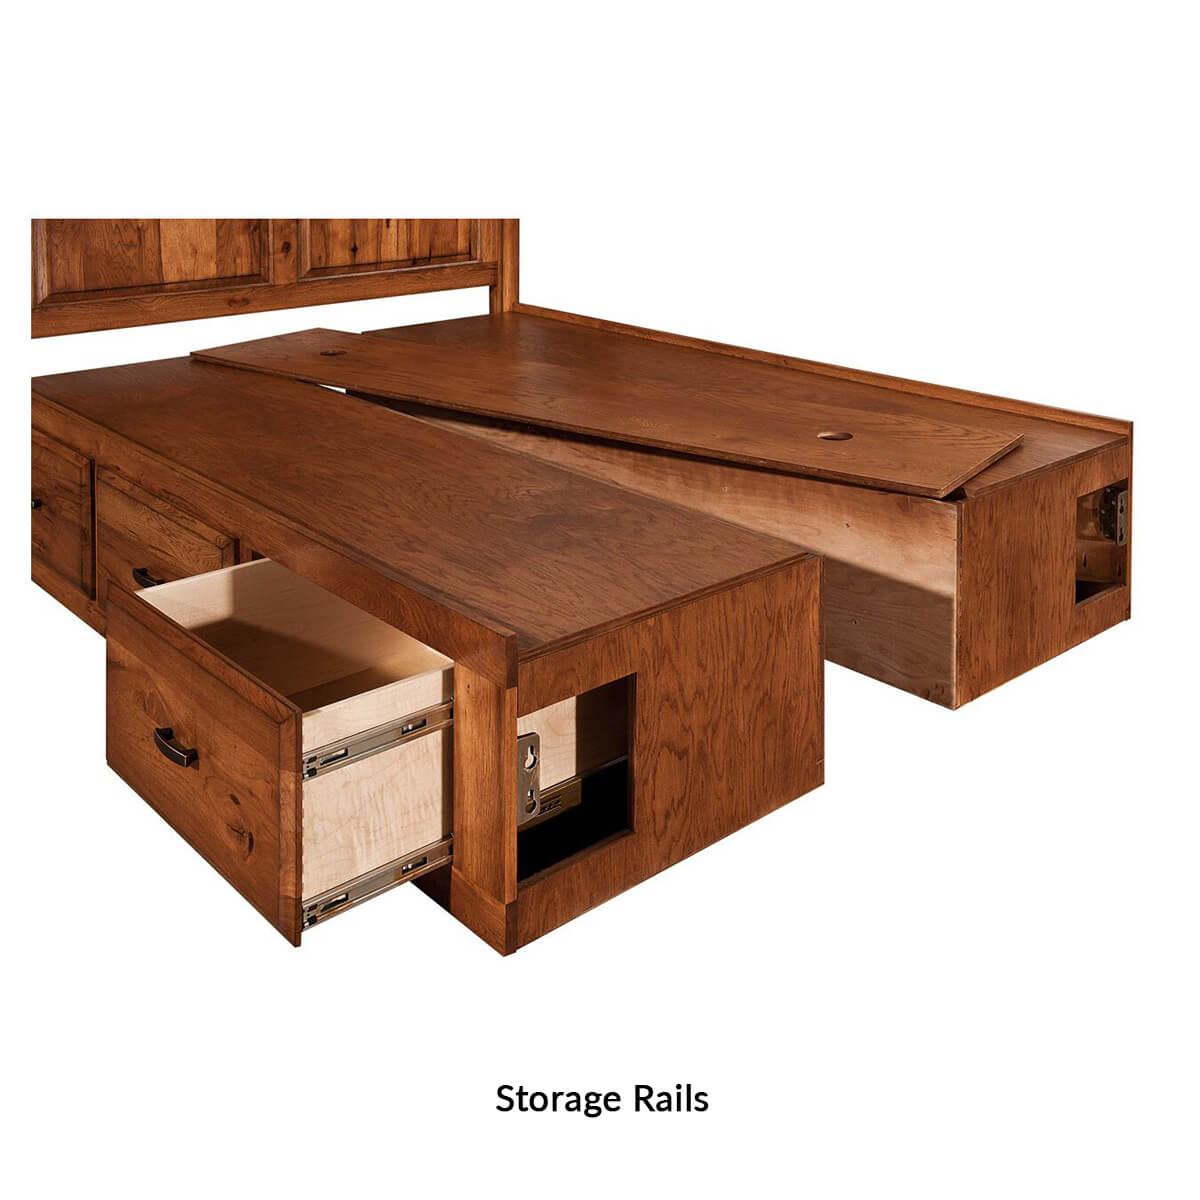 5.3-storage-rails.jpg